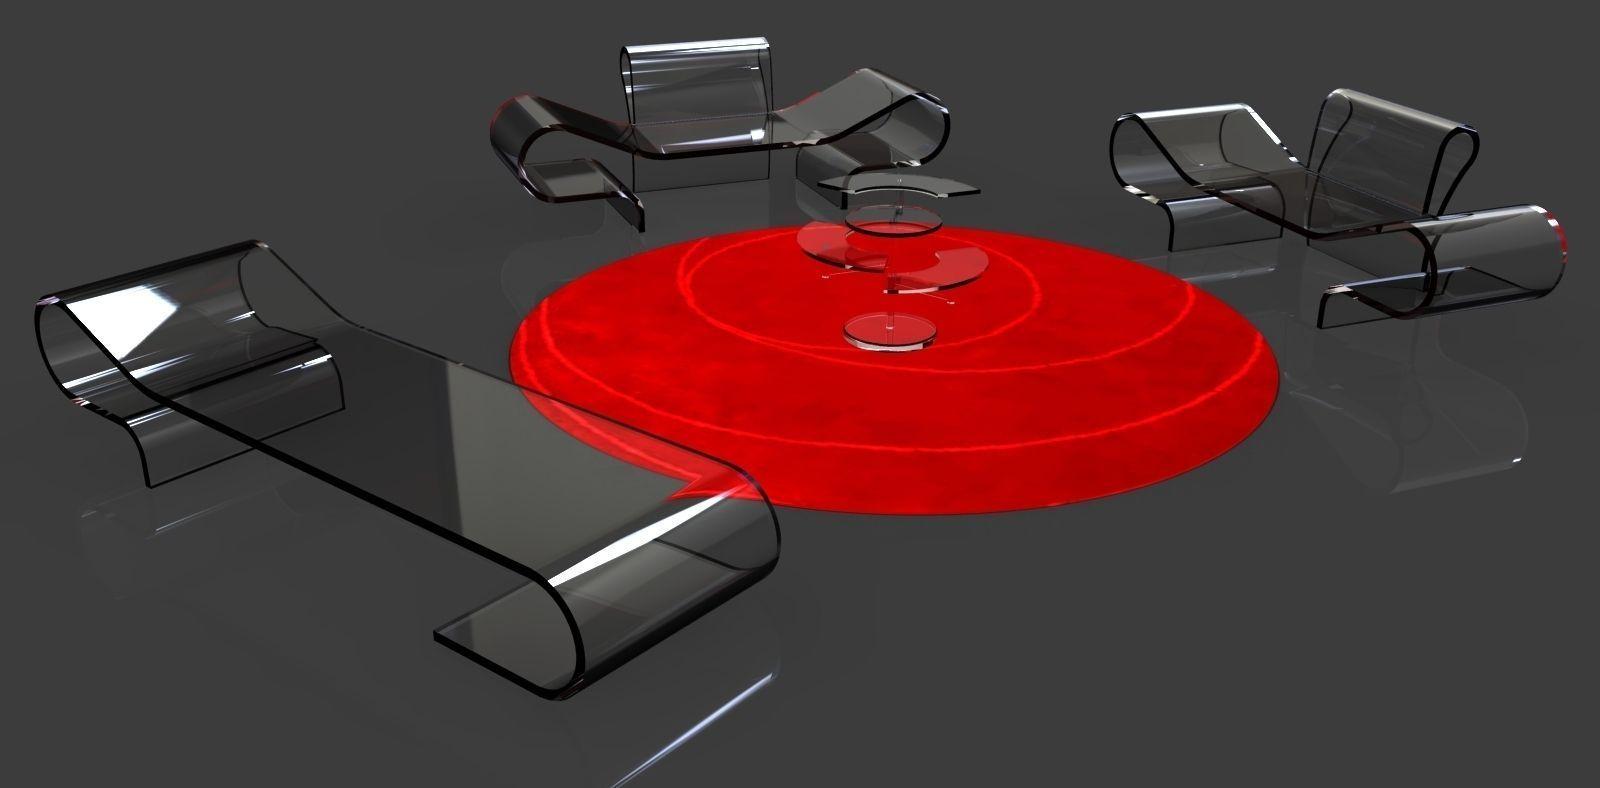 Transparent aluminum furniture free 3D Model DWG  : transparent aluminum furniture 3d model dwg from www.cgtrader.com size 1600 x 788 jpeg 59kB